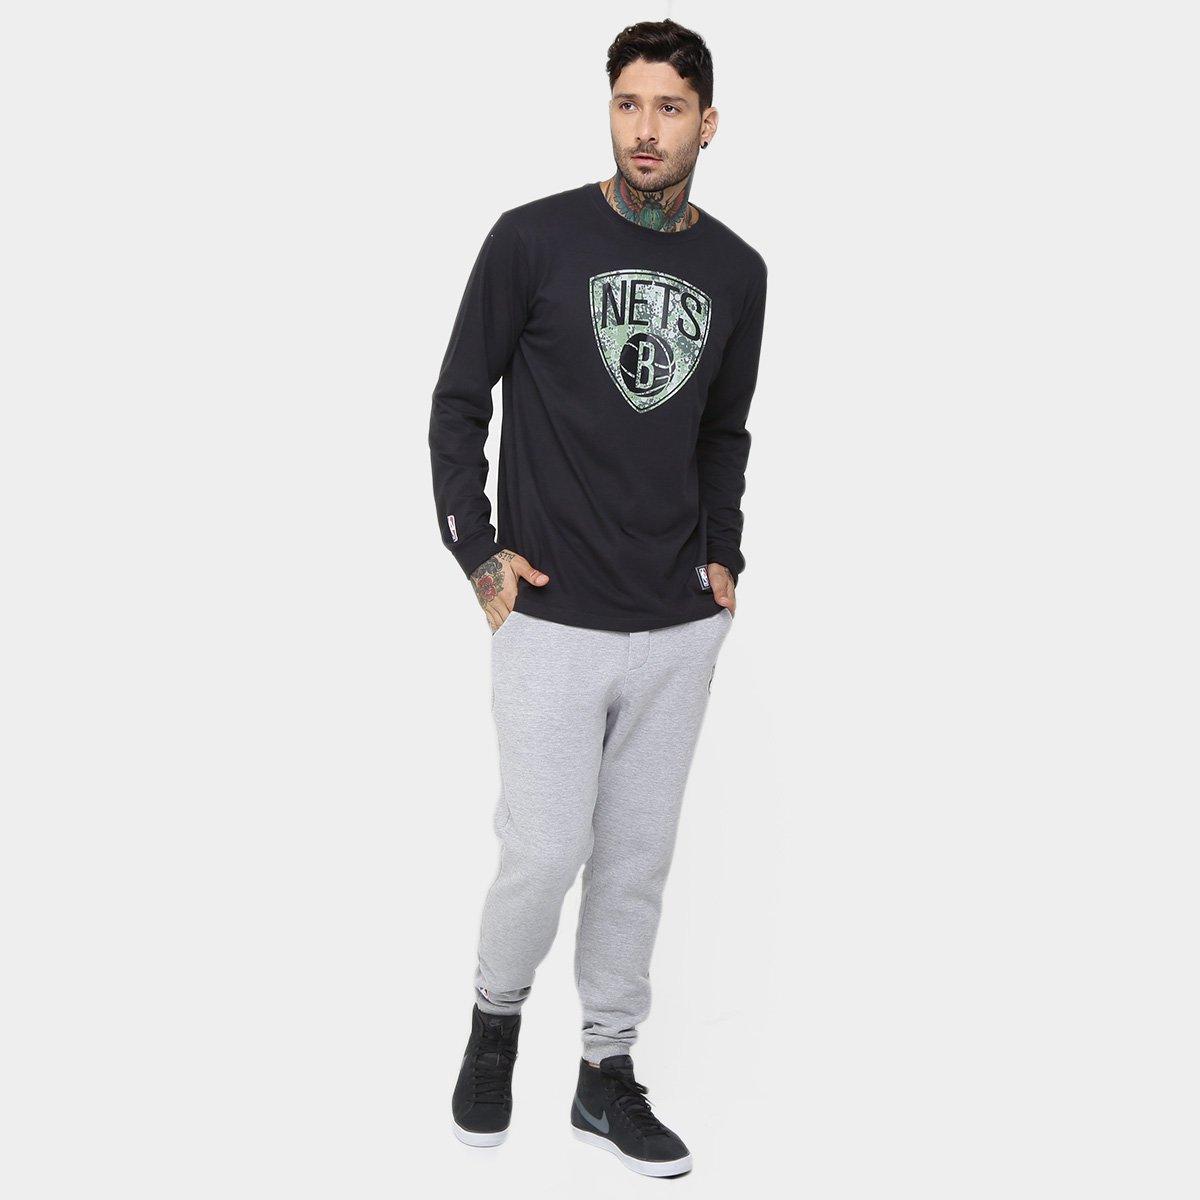 Calça New Era NBA Recorte Brooklyn Nets - Compre Agora  a368c11997cb6